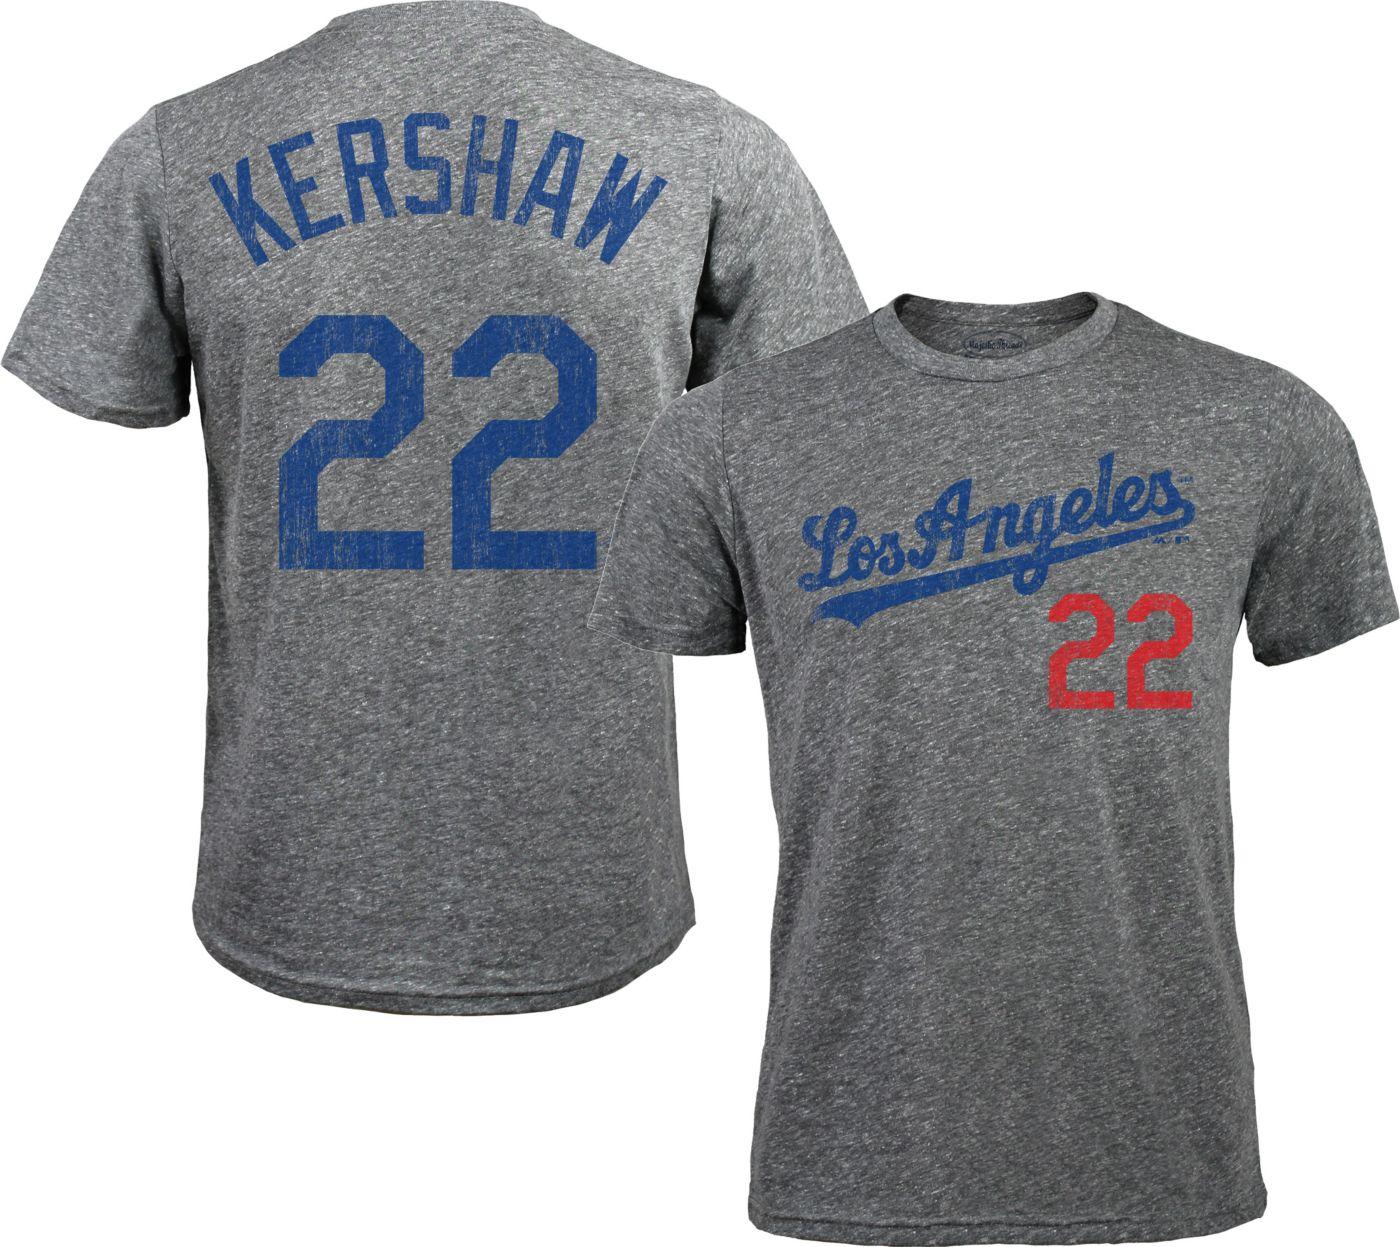 Majestic Threads Men's Los Angeles Dodgers Clayton Kershaw #22 Grey Tri-Blend T-Shirt